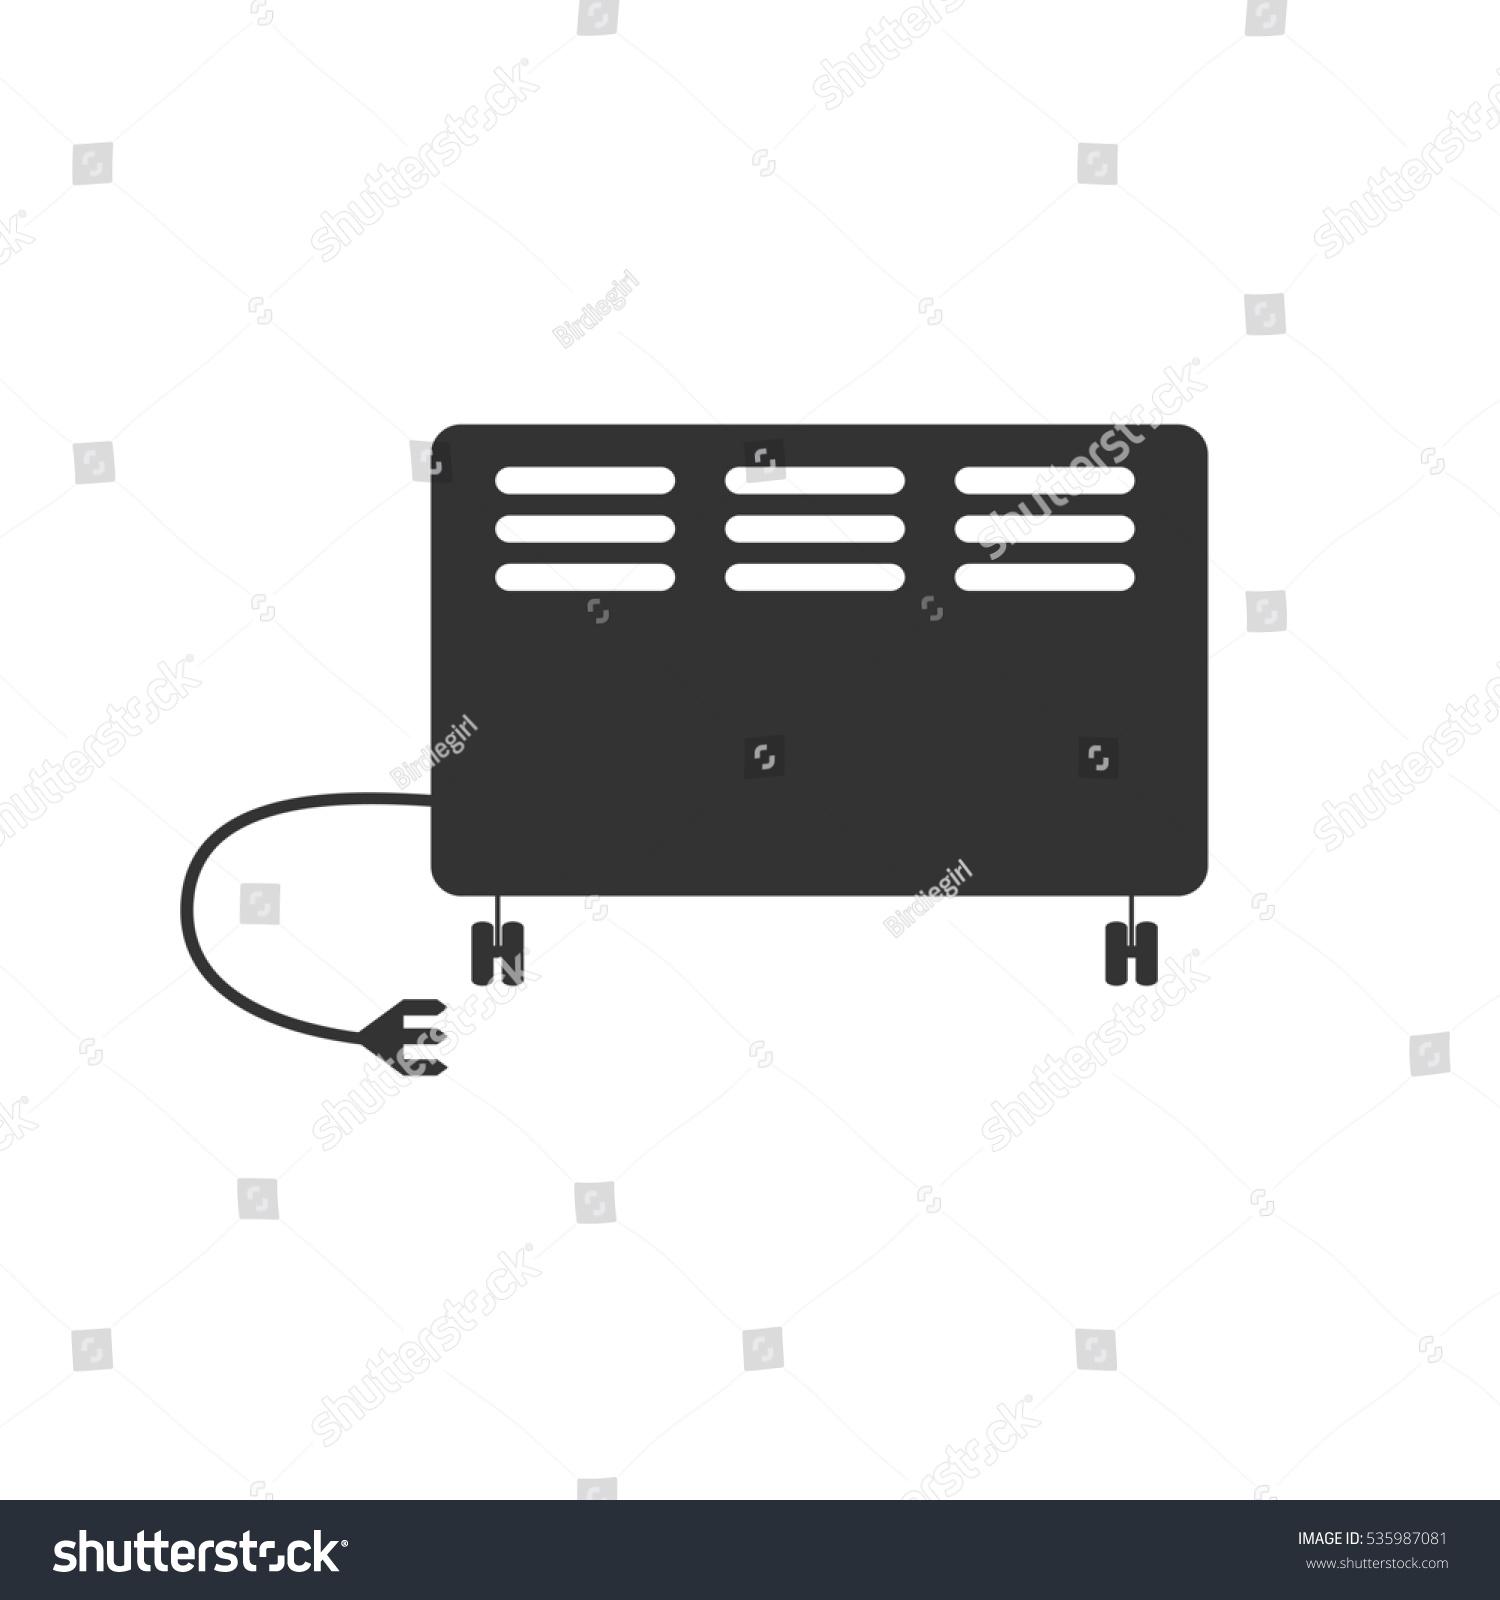 Electric Heater Icon Flat Grey Symbol Stock Illustration 535987081 ...